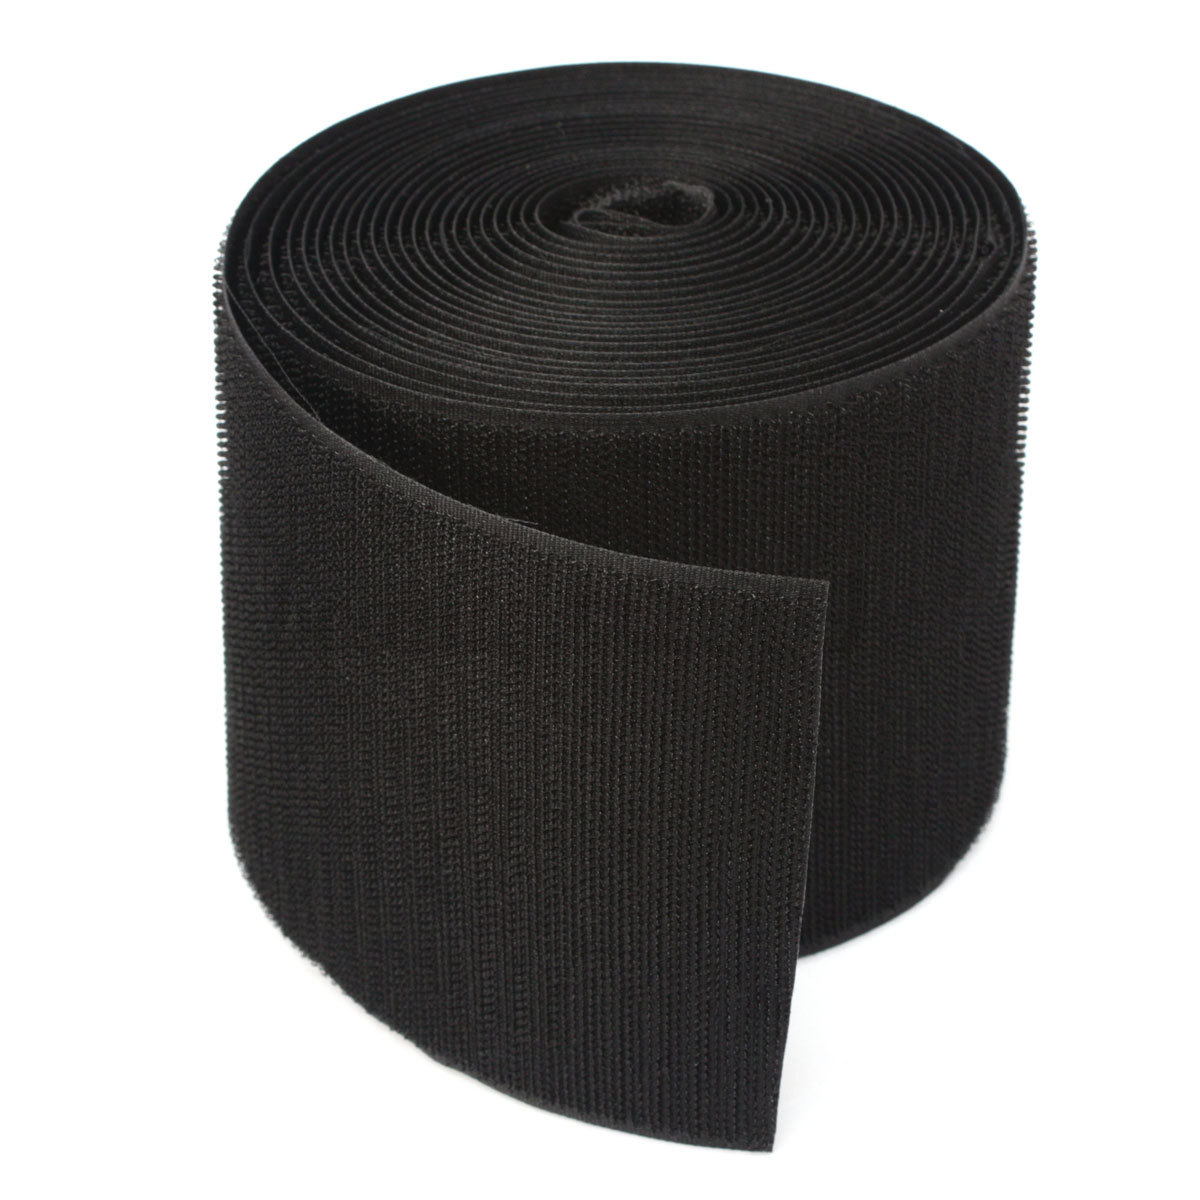 black cable cover for carpet nylon wire cloth glue 5m length 100mm width ebay. Black Bedroom Furniture Sets. Home Design Ideas